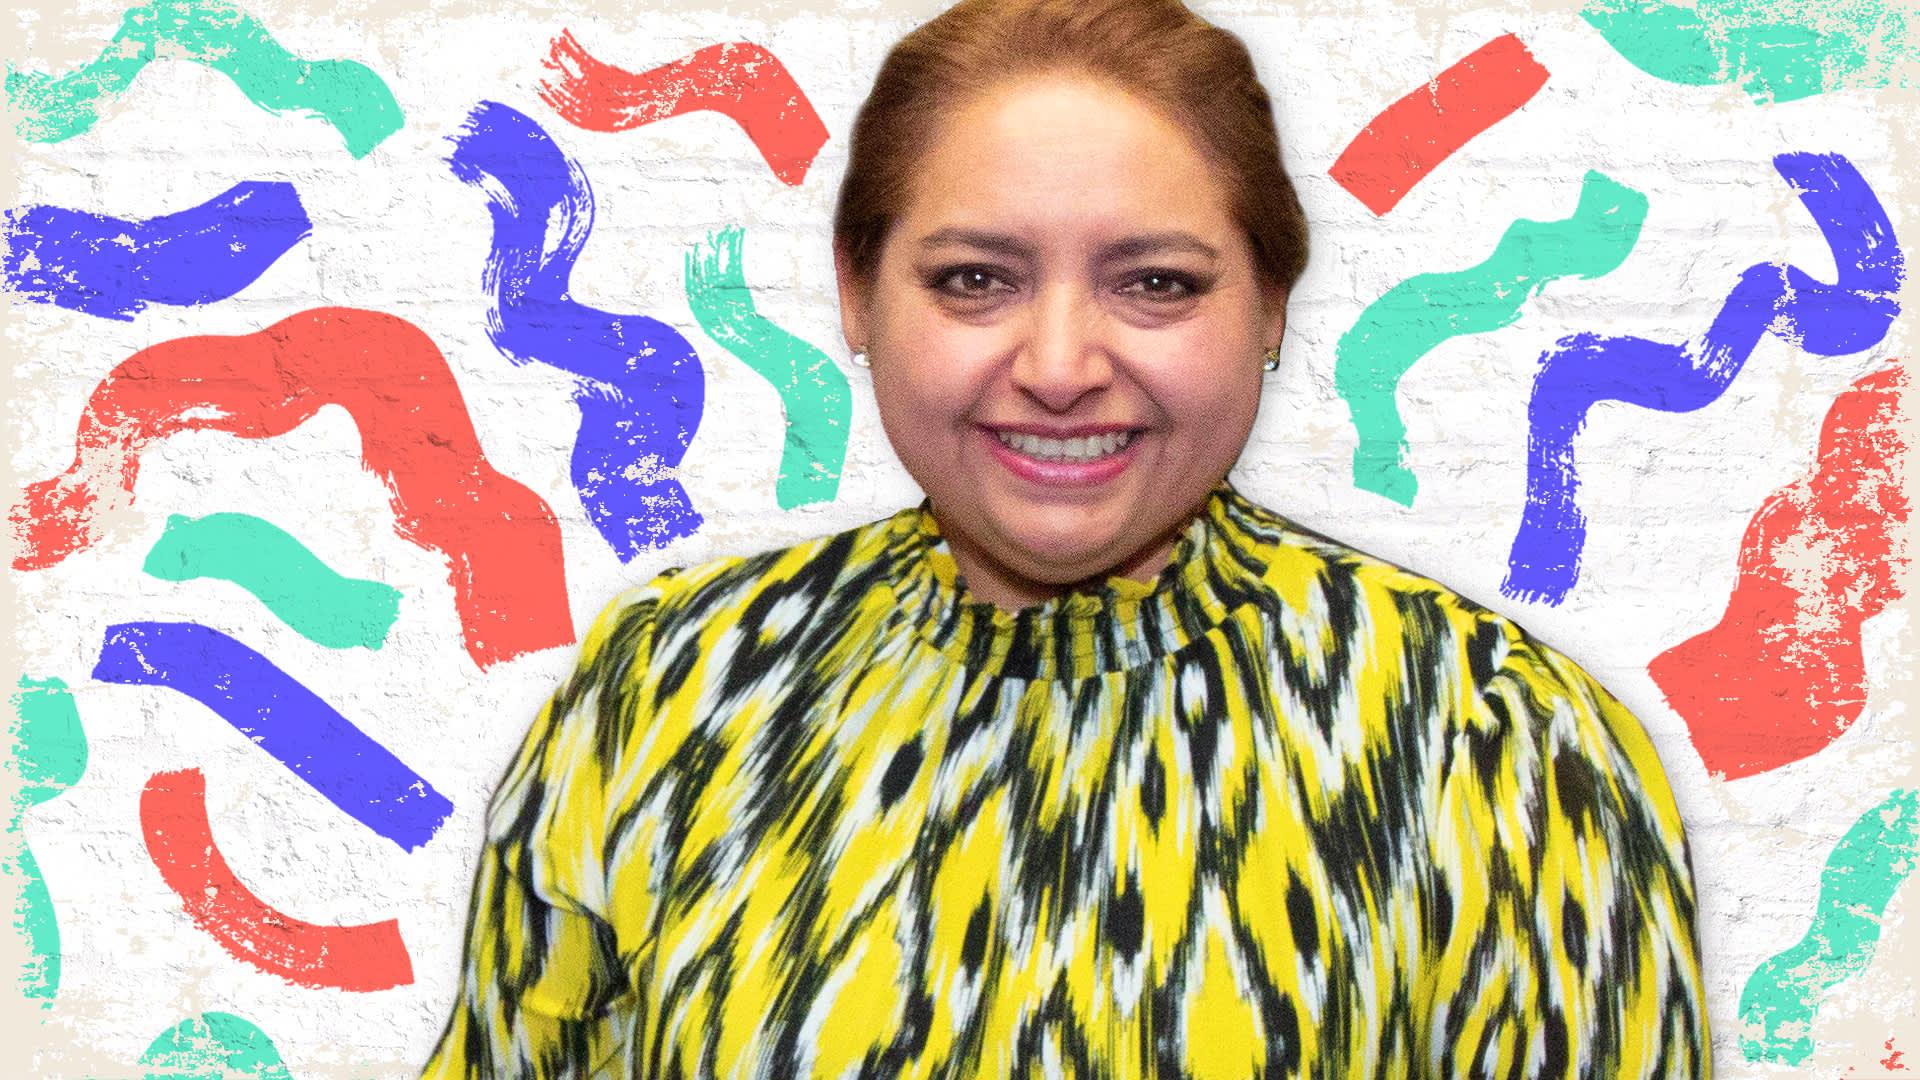 Karina Cruz, Founder and Owner, Karina Cruz Enterprise, K's Balloons Inspirations